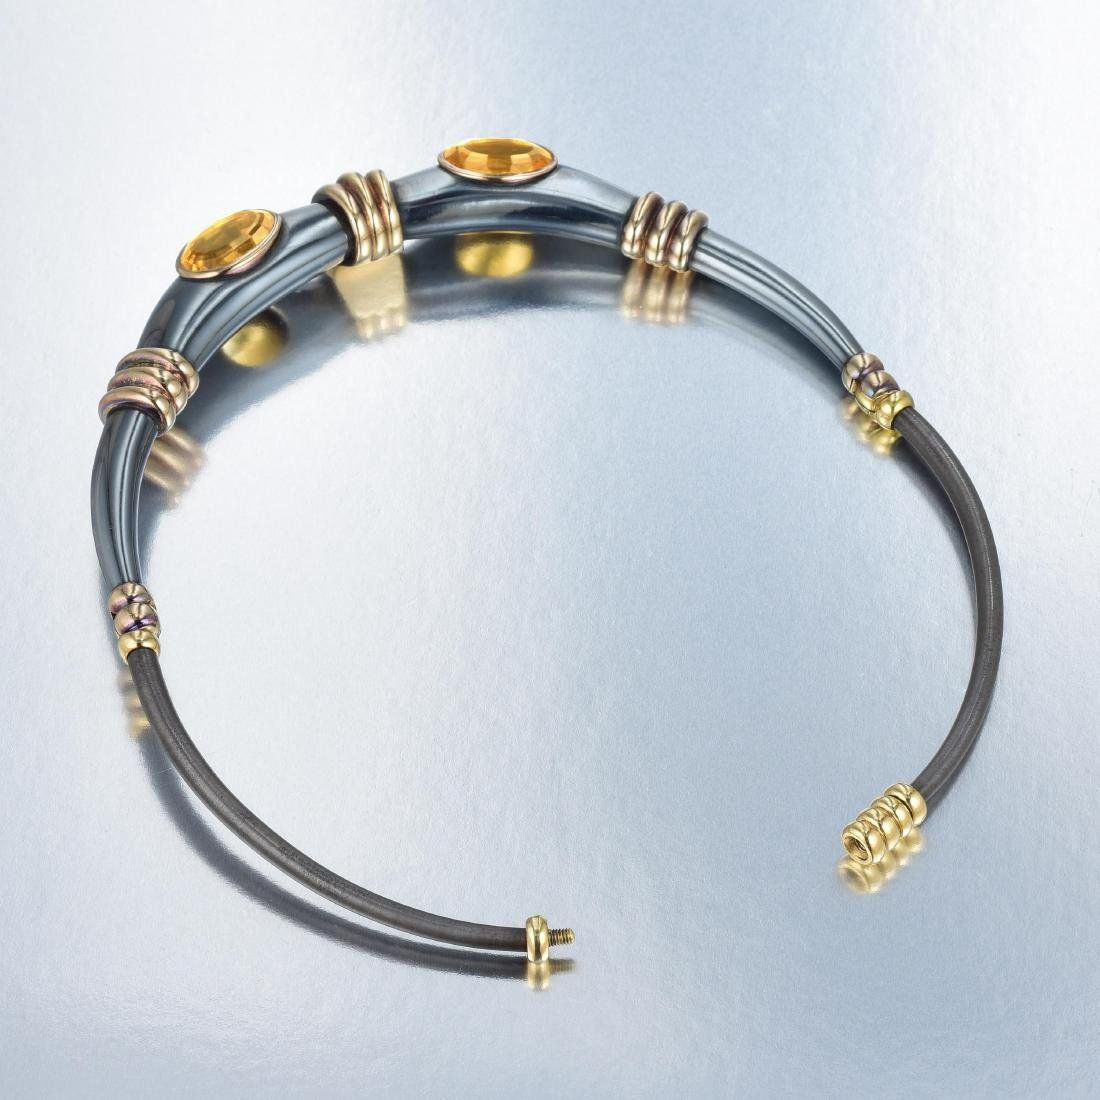 Rene Boivin Citrine Choker Necklace - 5